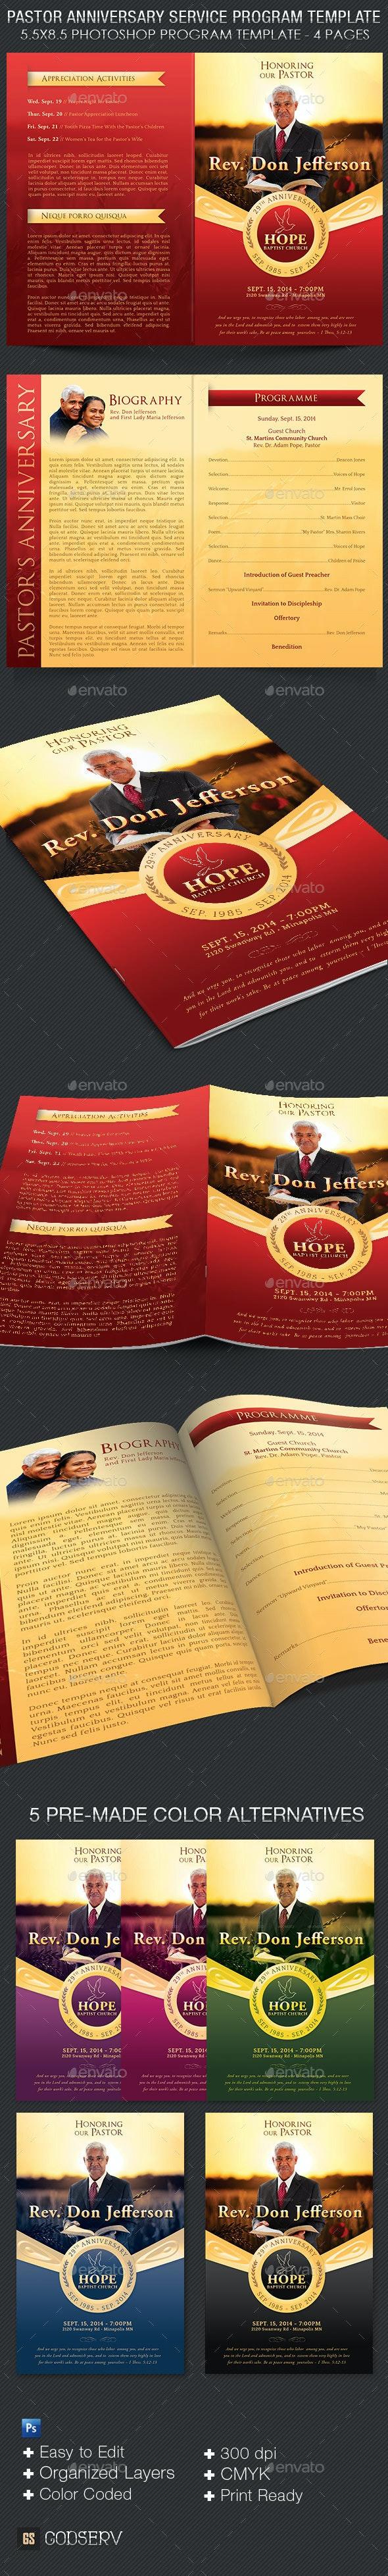 Pastor Anniversary Service Program Template - Informational Brochures